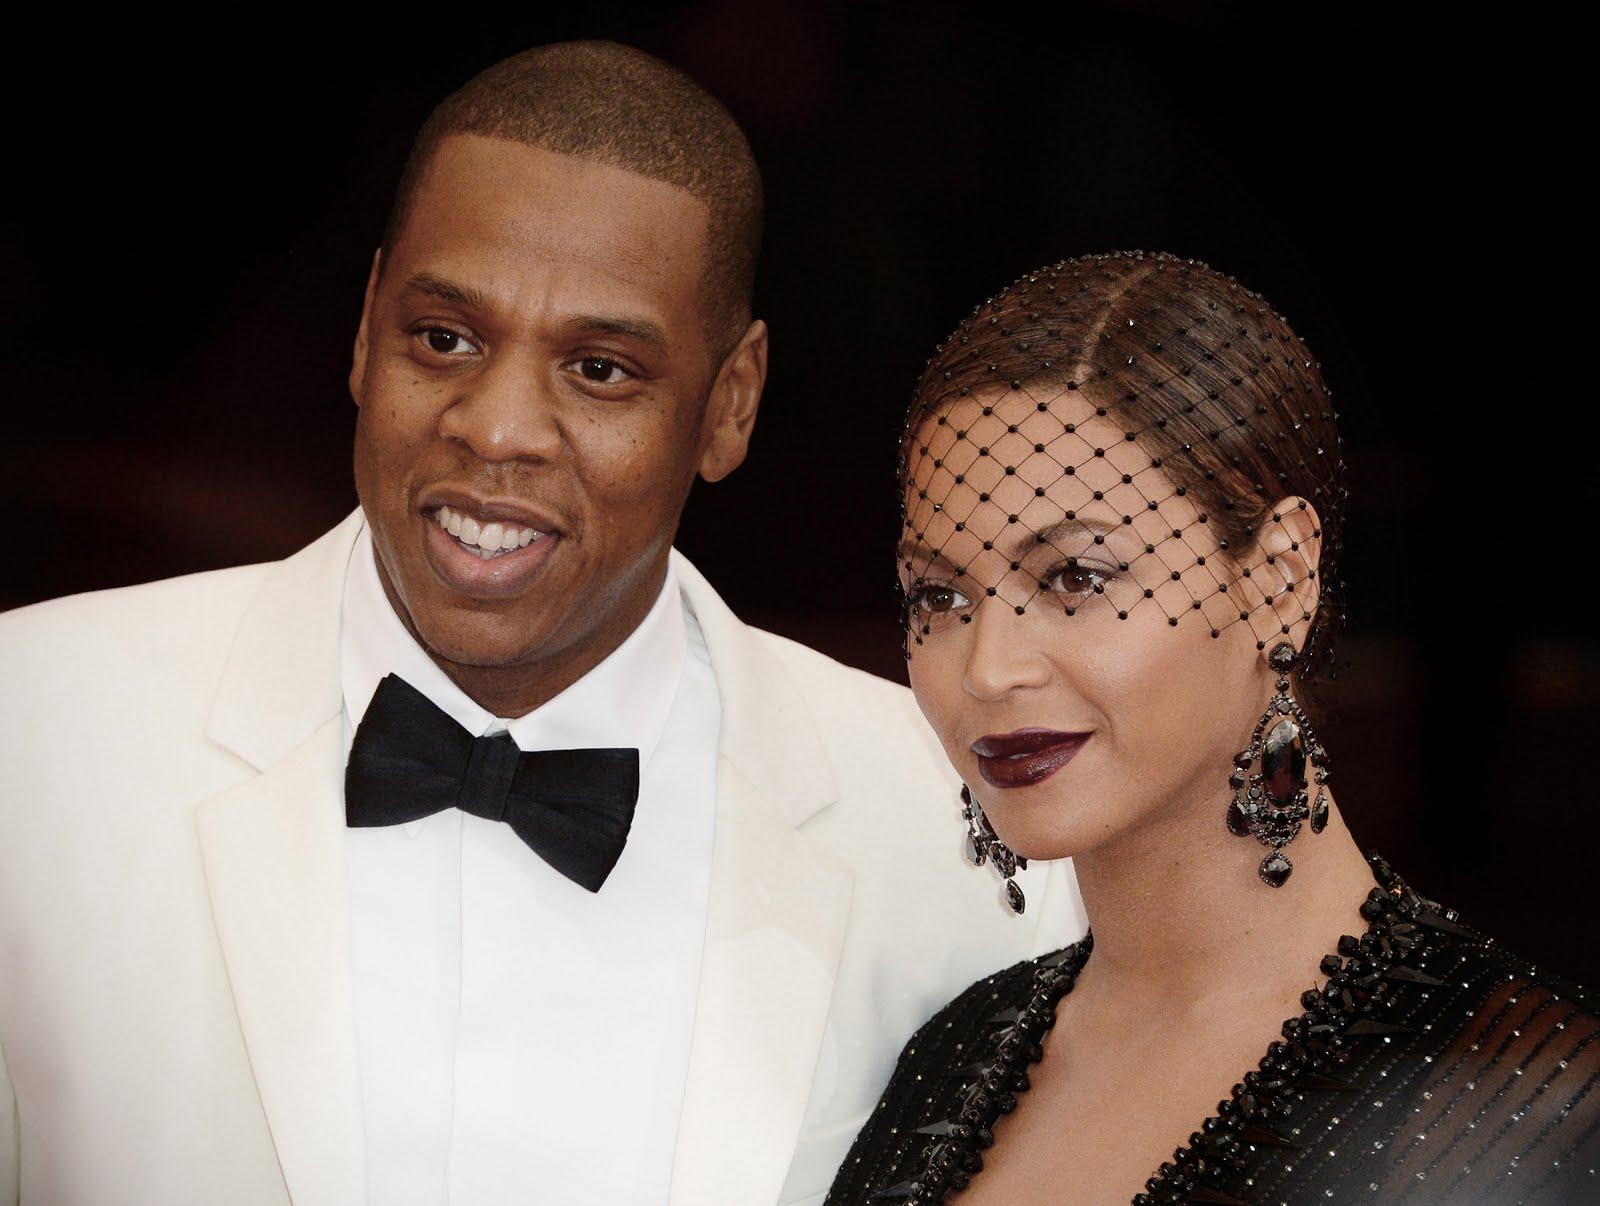 Lagu Lagu Terbaru Beyonce & Jay-Z + Video